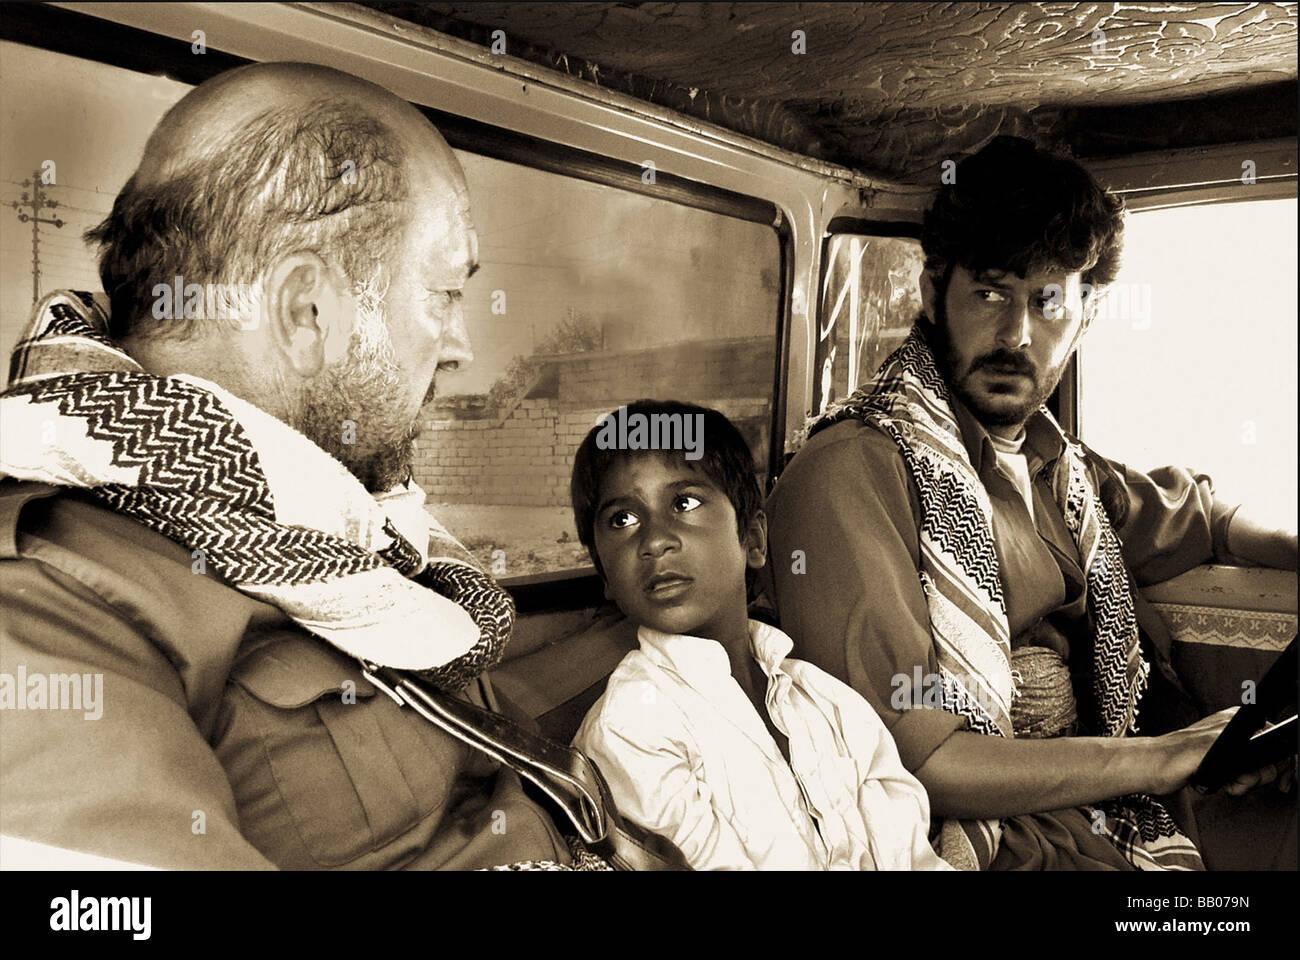 Parinawa la ghobar Crossing the Dust Year : 2006 Director : Shawkat Amin Korki Adil Abdolrahman, Abdola Awayd, Hossein - Stock Image